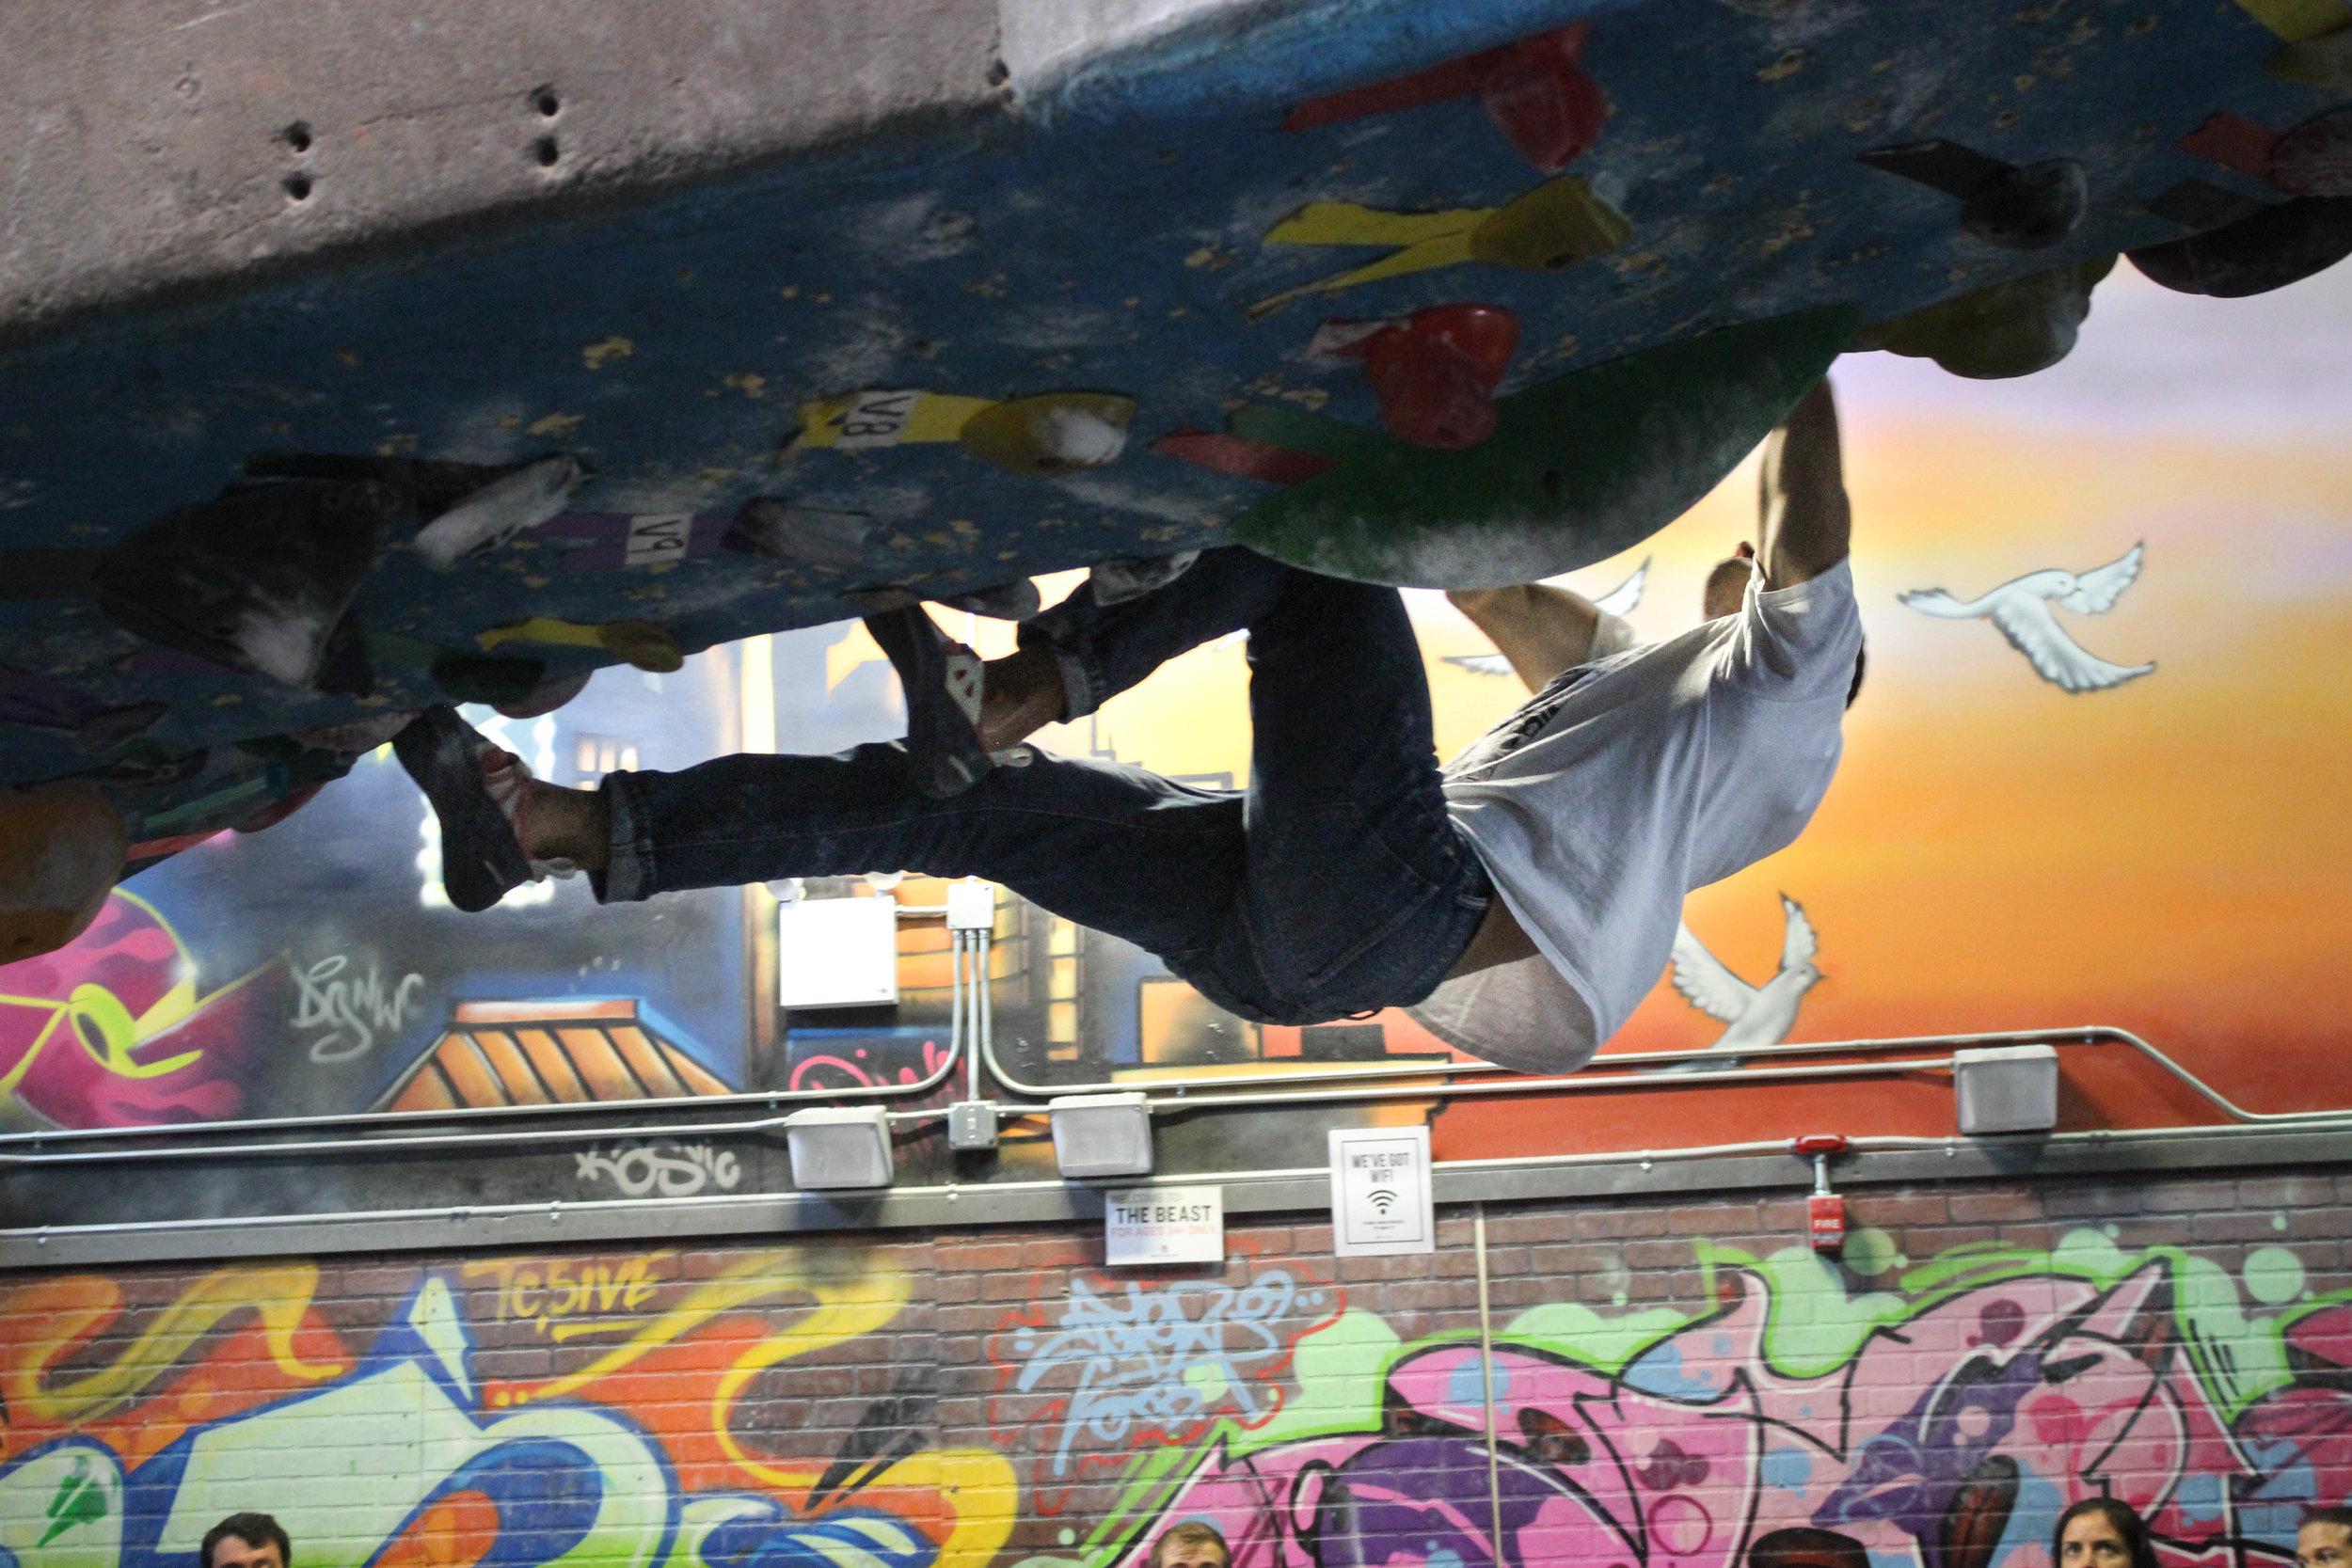 INDOOR ROCK CLIMBING: A POWERFUL & FUN WAY TO GET IN SHAPE   Brooklyn, New York